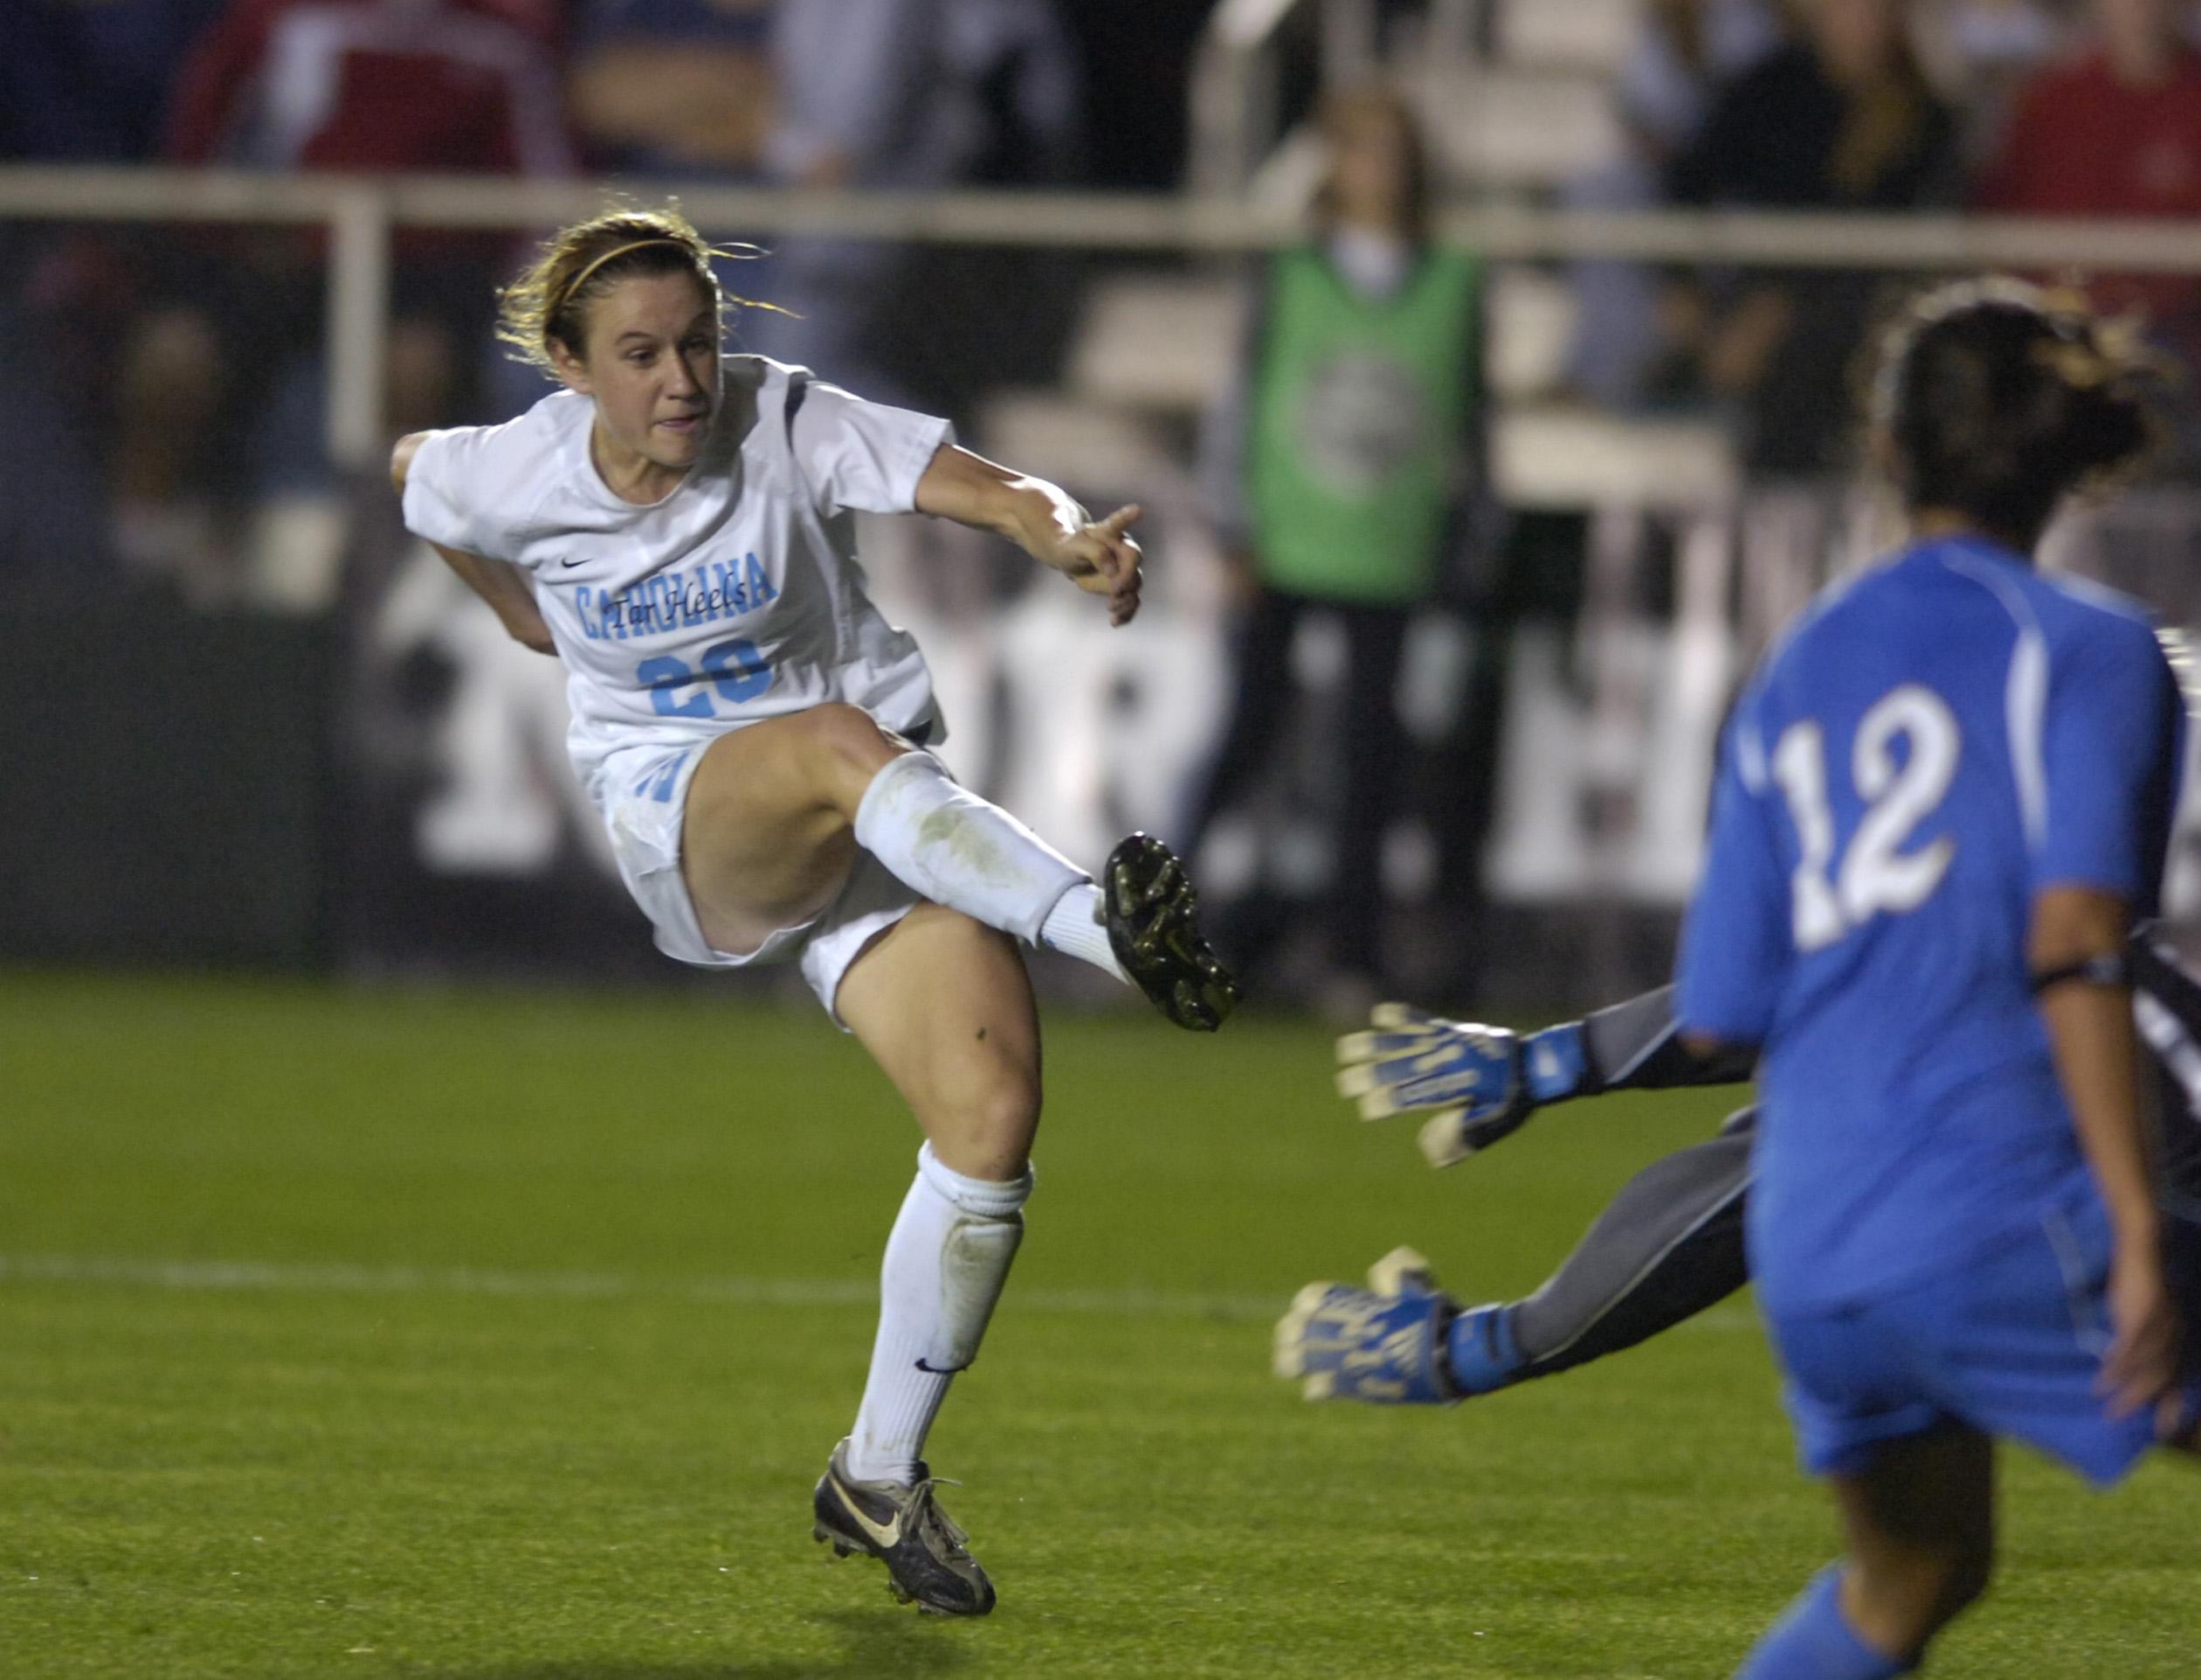 UNC v UCLA Women's Soccer North Carolina won 2-0 NCAA National Semi-Finals SAS Soccer Park Cary, NC December 1, 2006